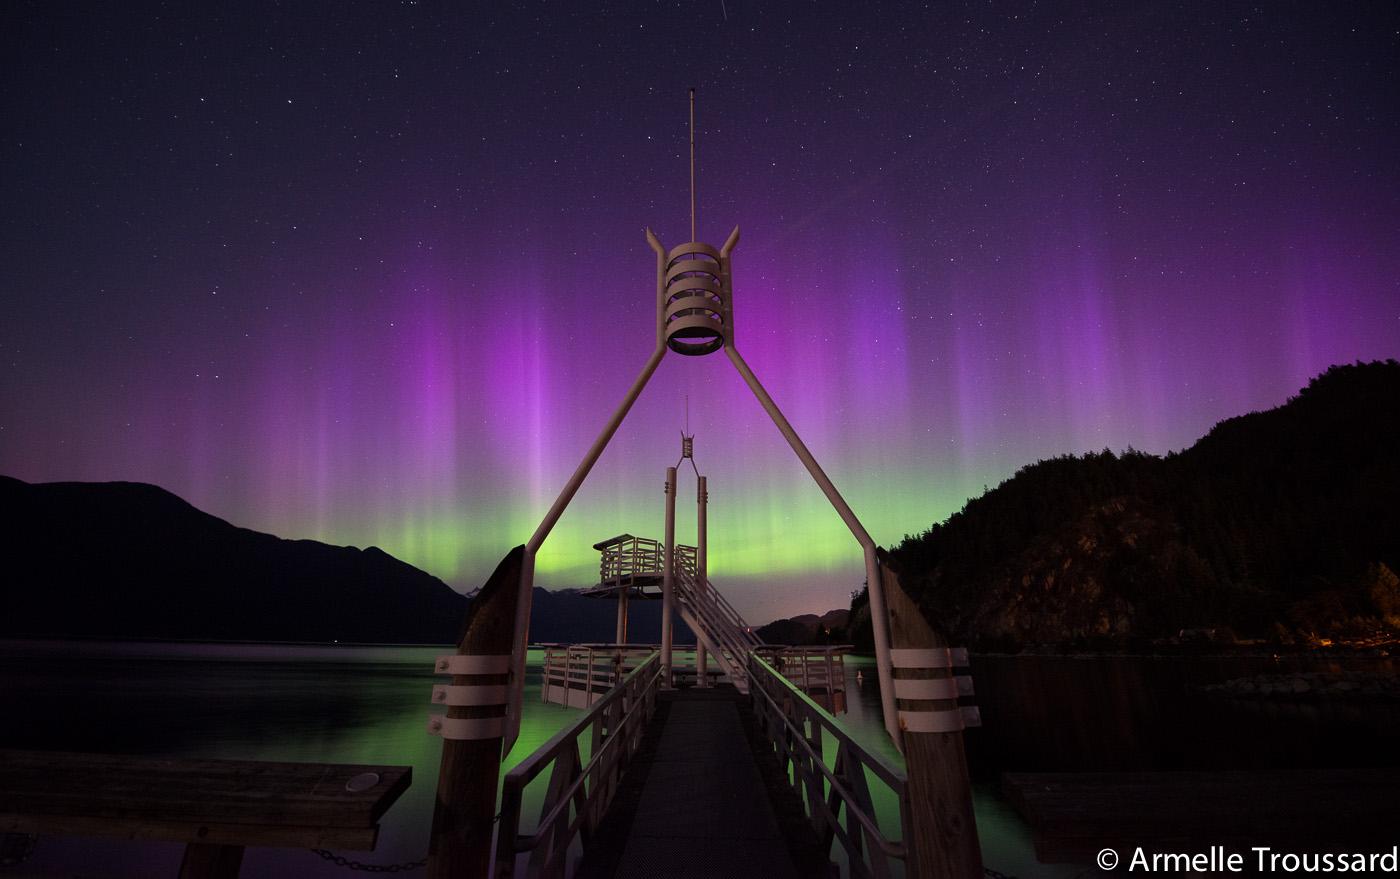 Aurora Borealis in Southern British Columbia, Canada.